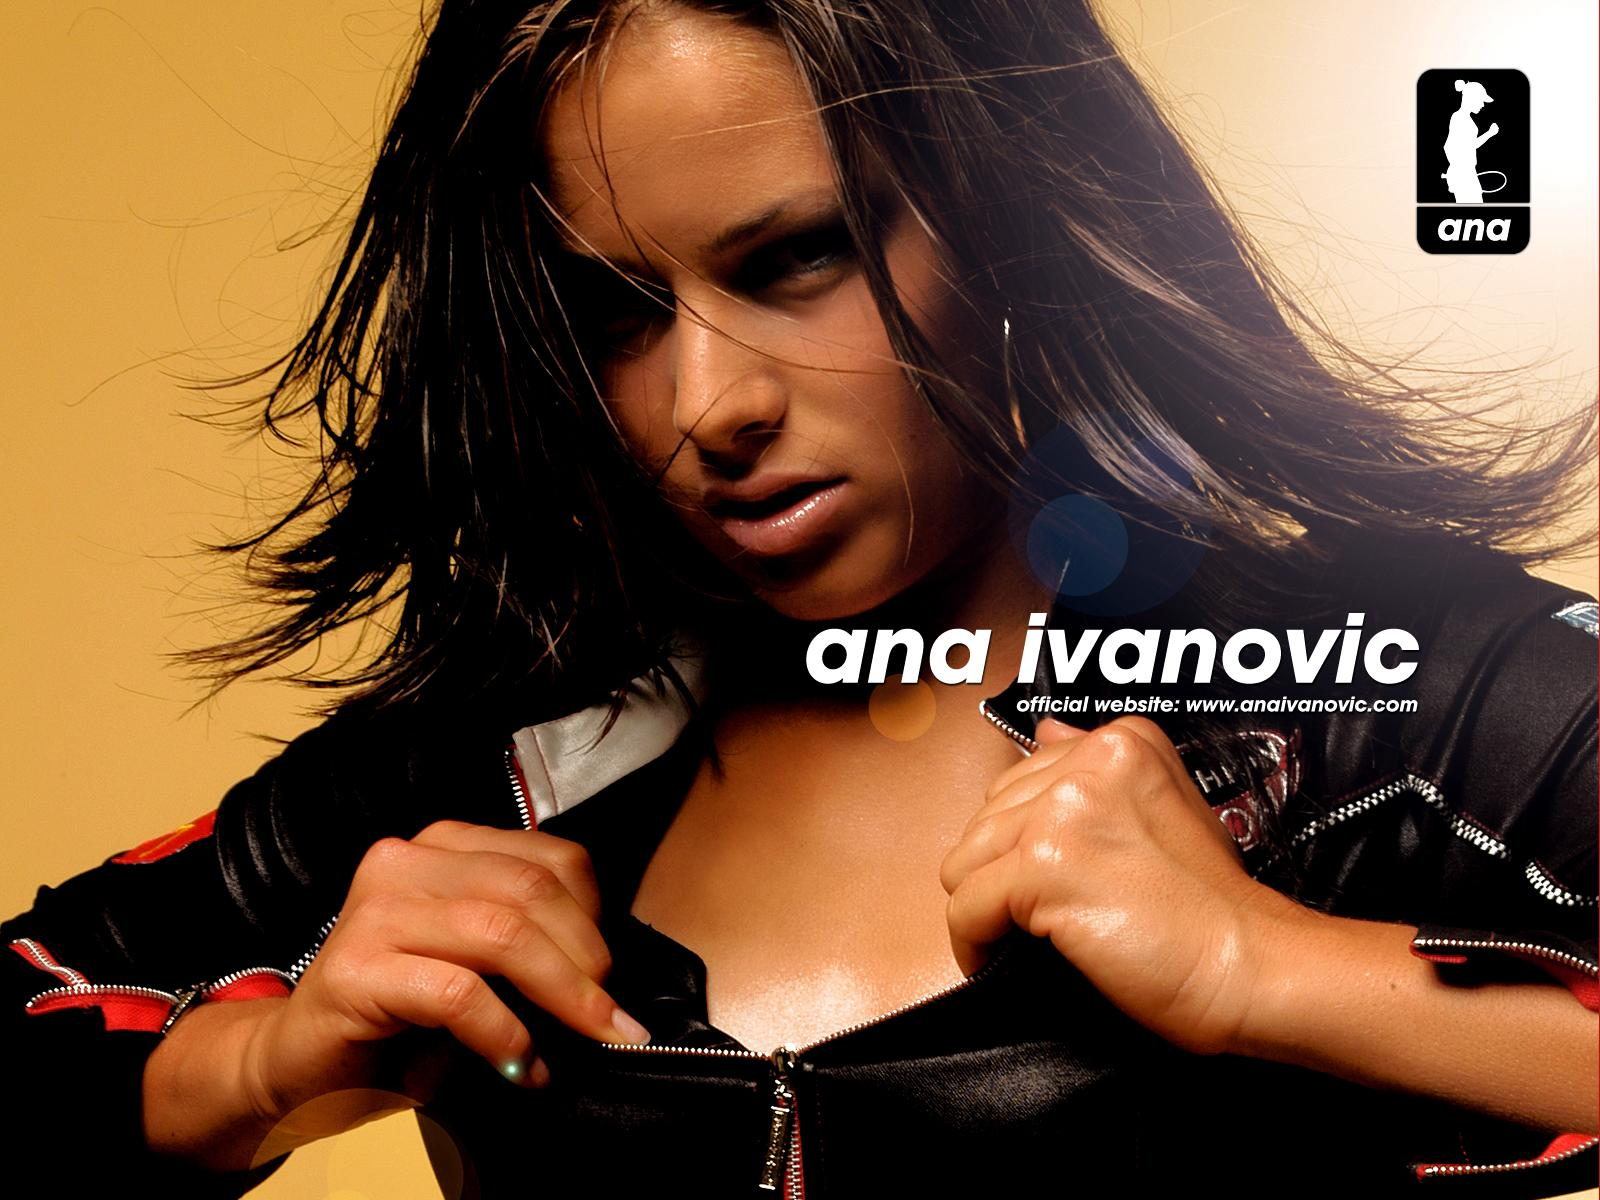 http://1.bp.blogspot.com/_COFcdZP8rlg/S-iJAbLNjAI/AAAAAAAACQk/nSxSuPyP4Uw/s1600/Ana+Ivanovic+(5).jpg